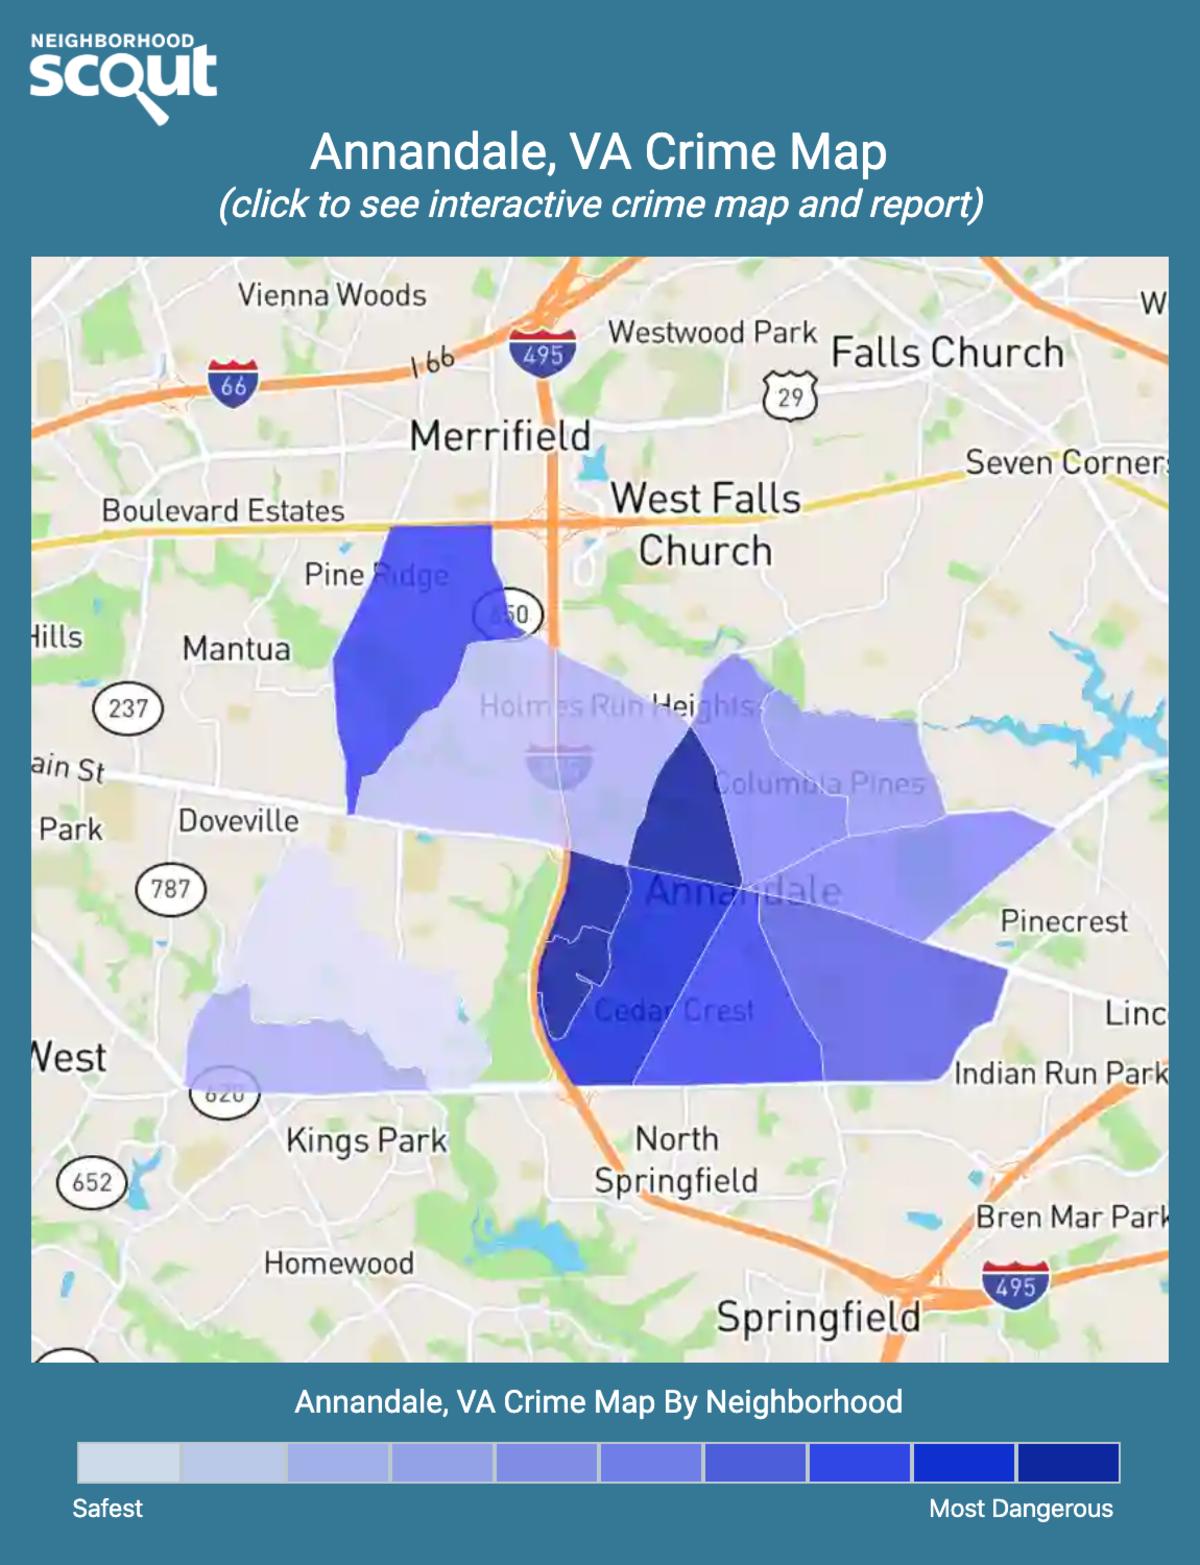 Annandale, Virginia crime map